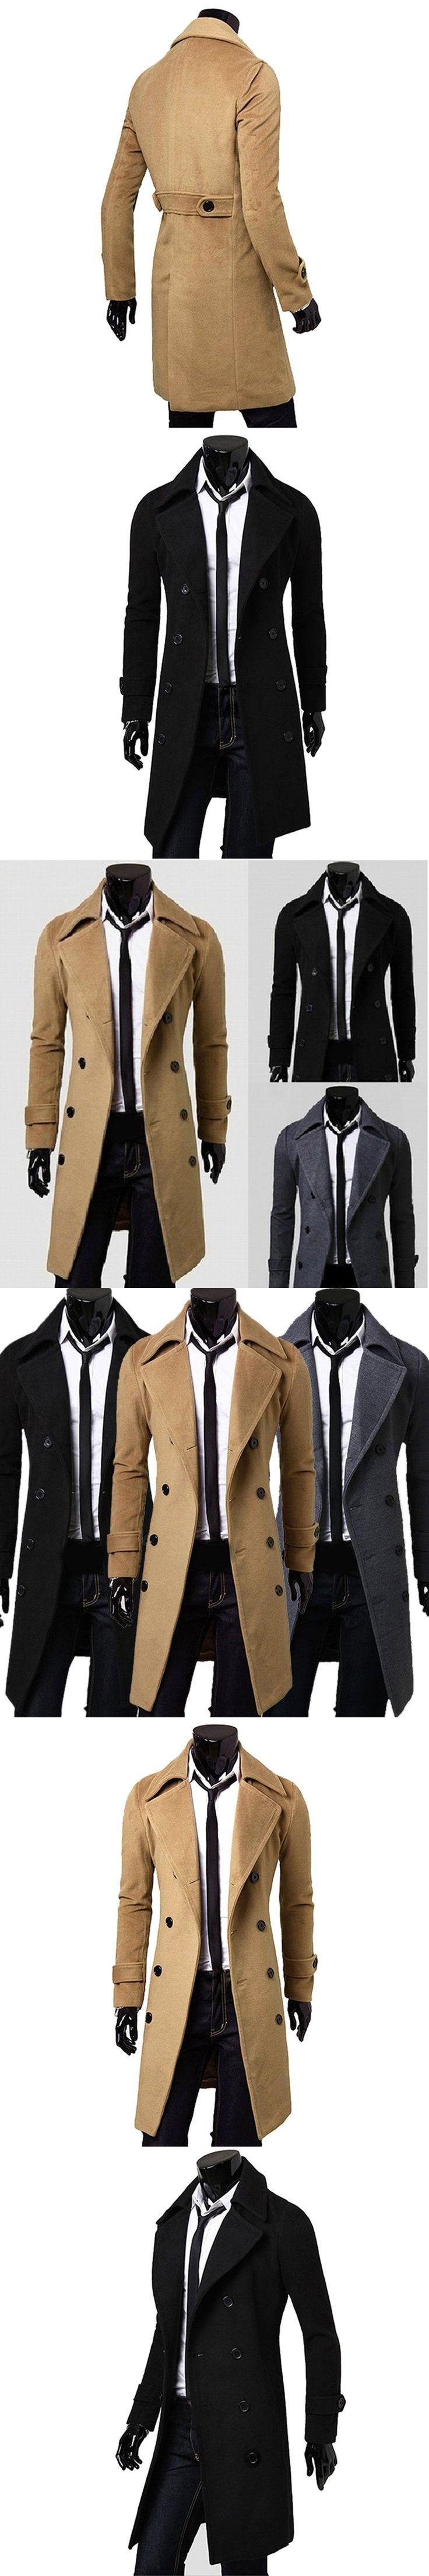 2017 New Arrival Autumn Winter Trench Coat Men Brand Clothing Fashion Mens Long Coat Top Male Overcoat  Gentleman